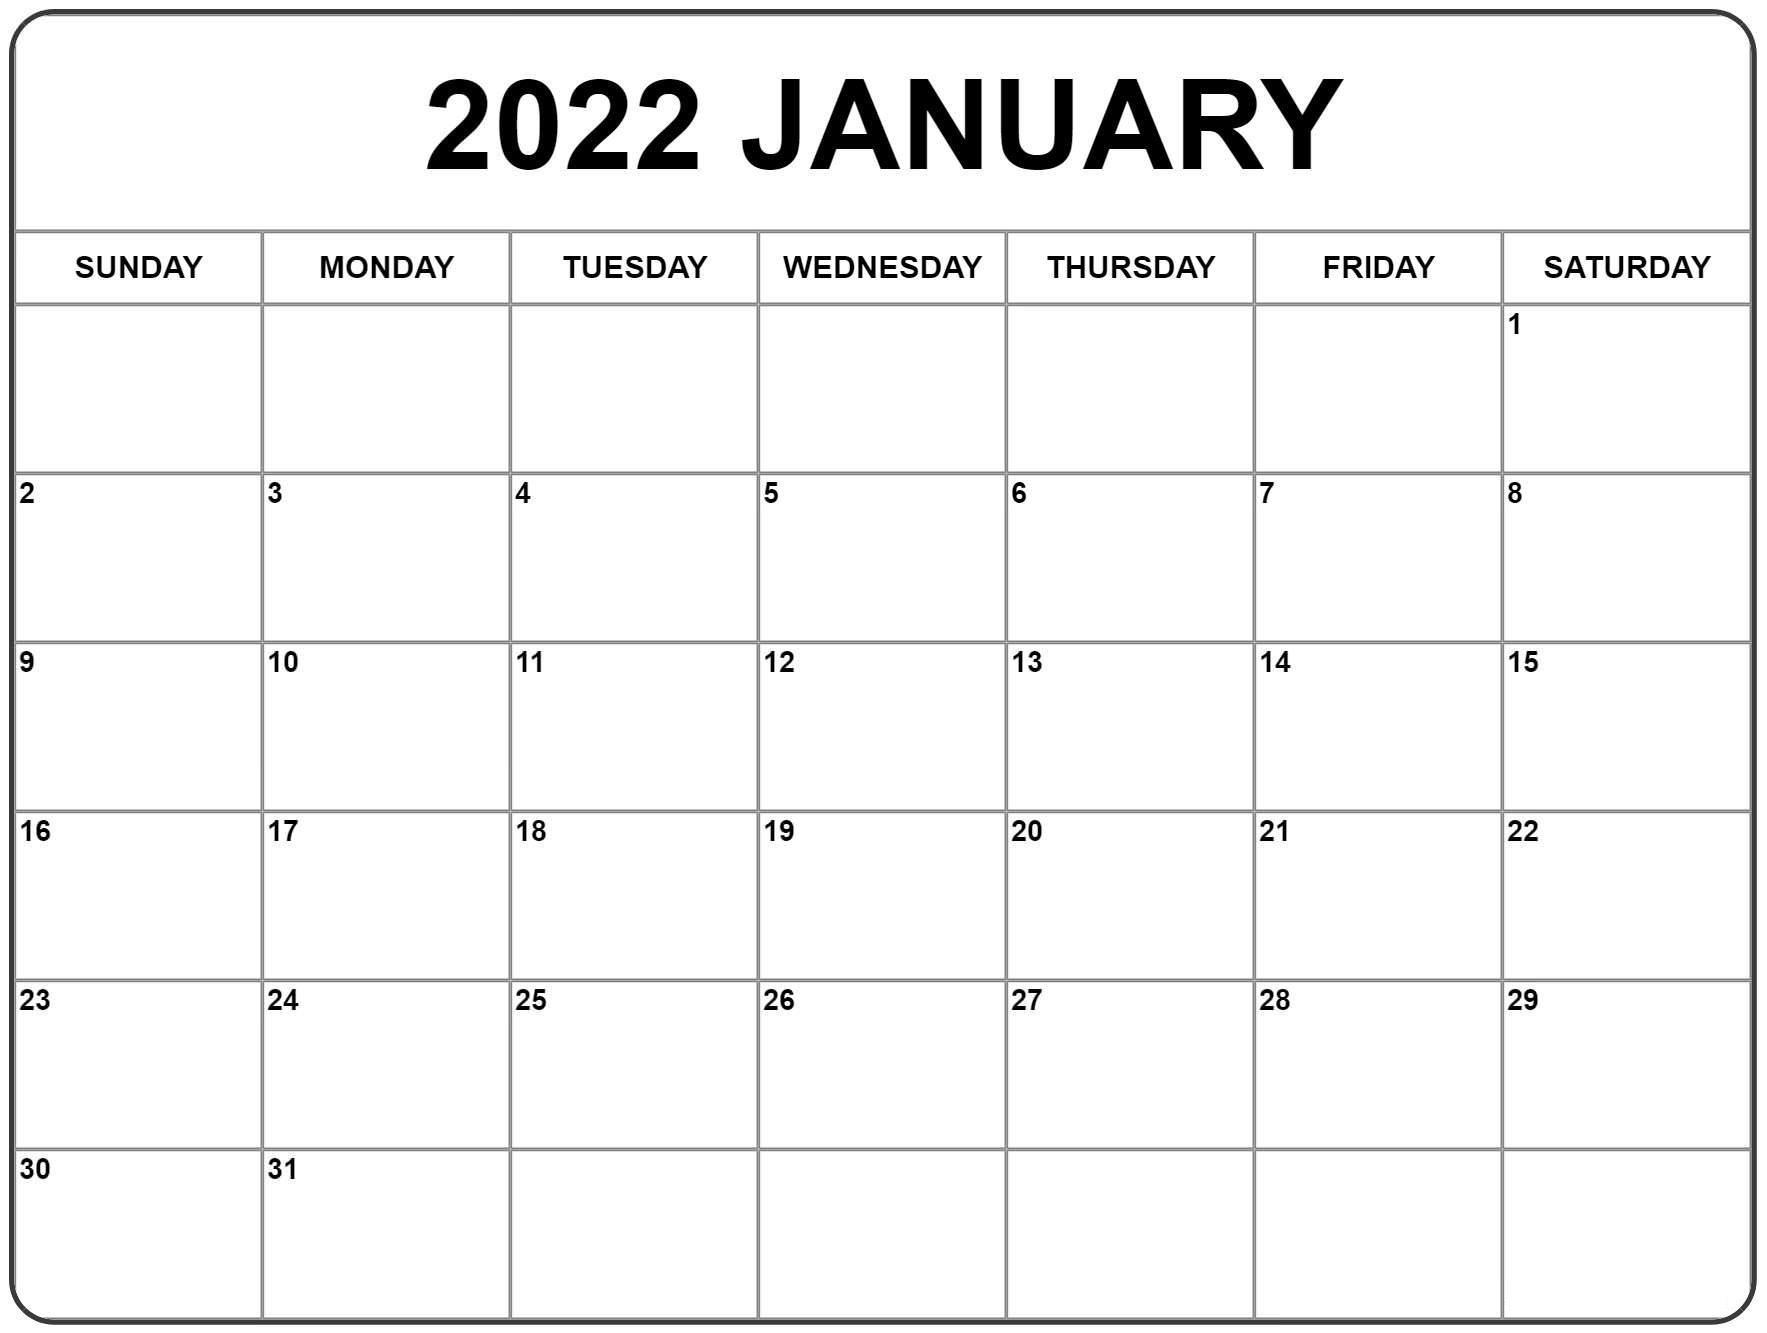 Free 2022 Printable Calendar One Page